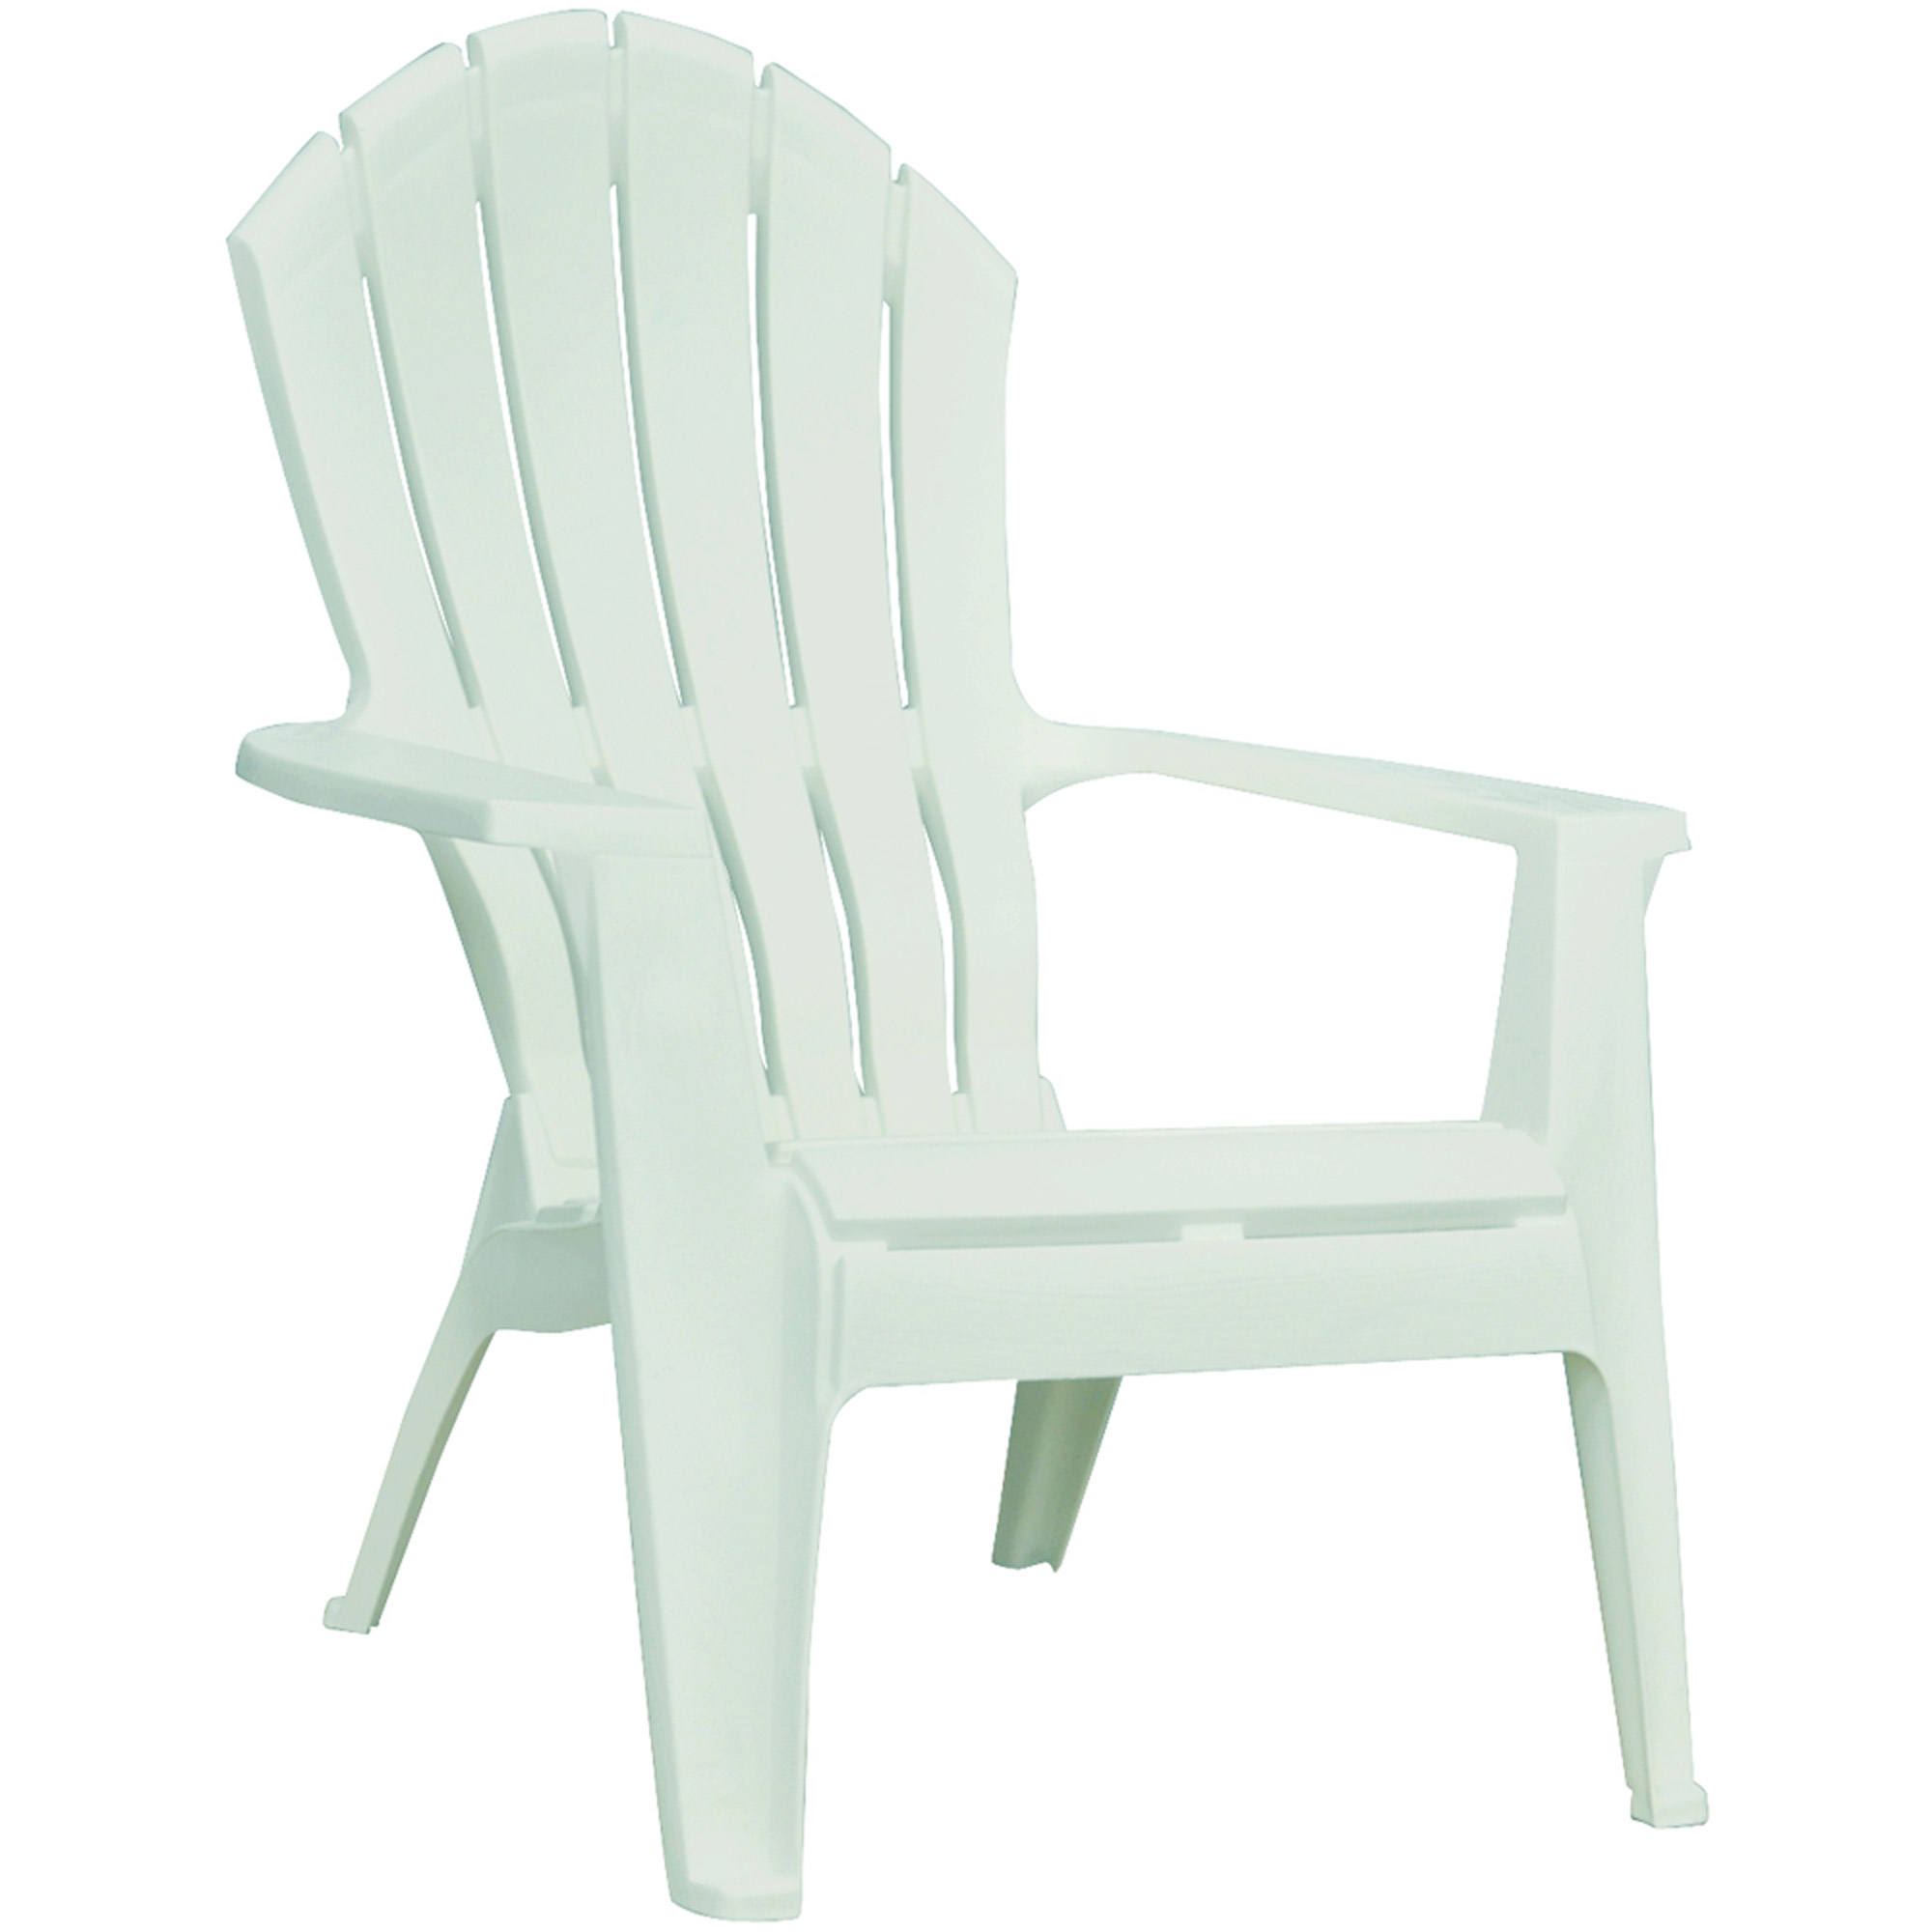 Adams USA RealComfort Adirondack Chair